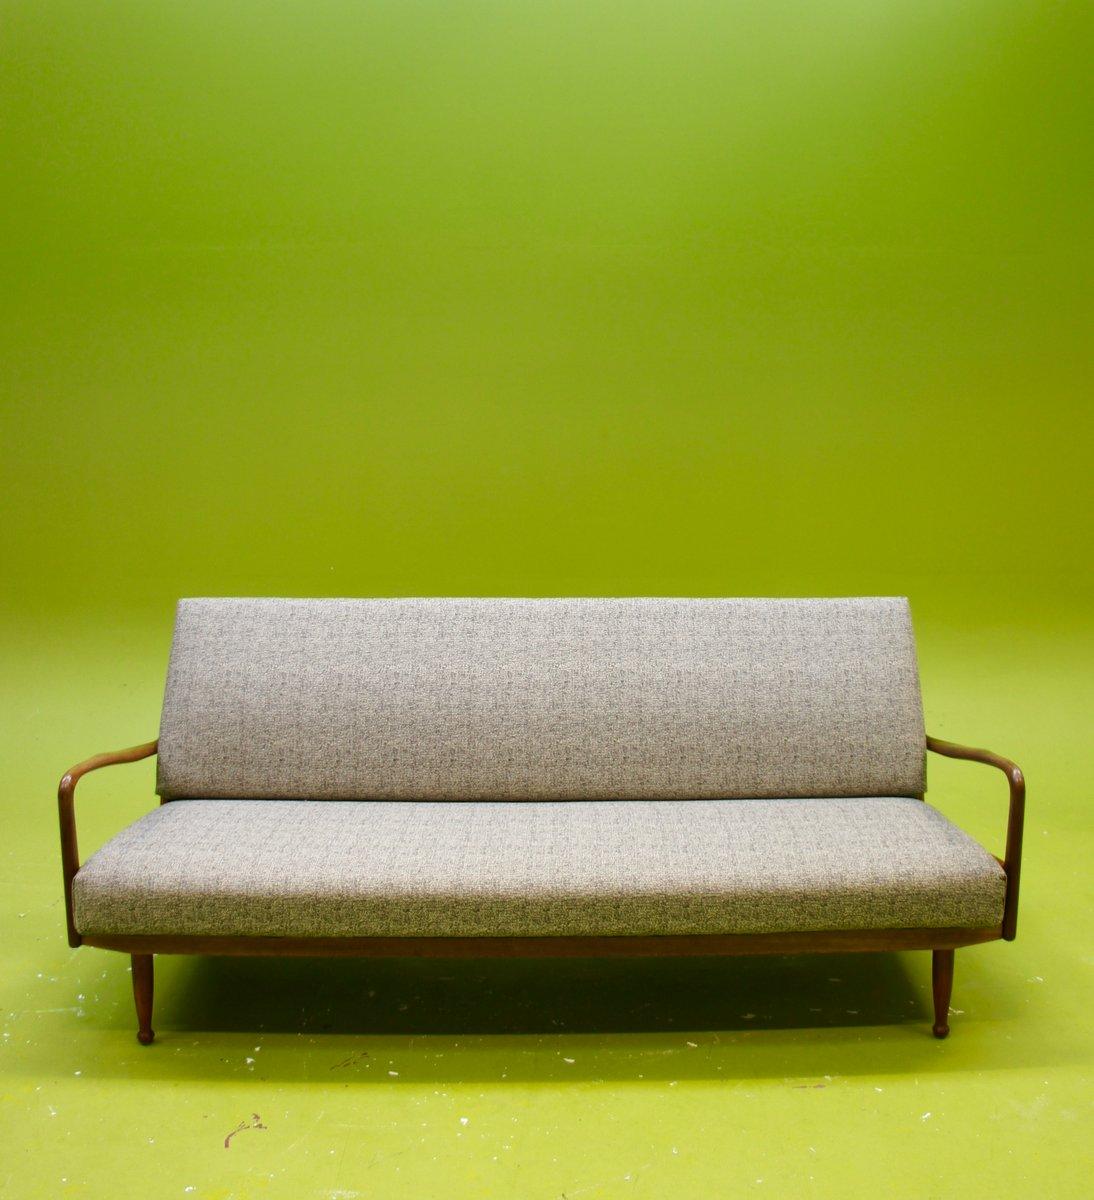 Vintage Sofa Bed From Greaves U0026 Thomas